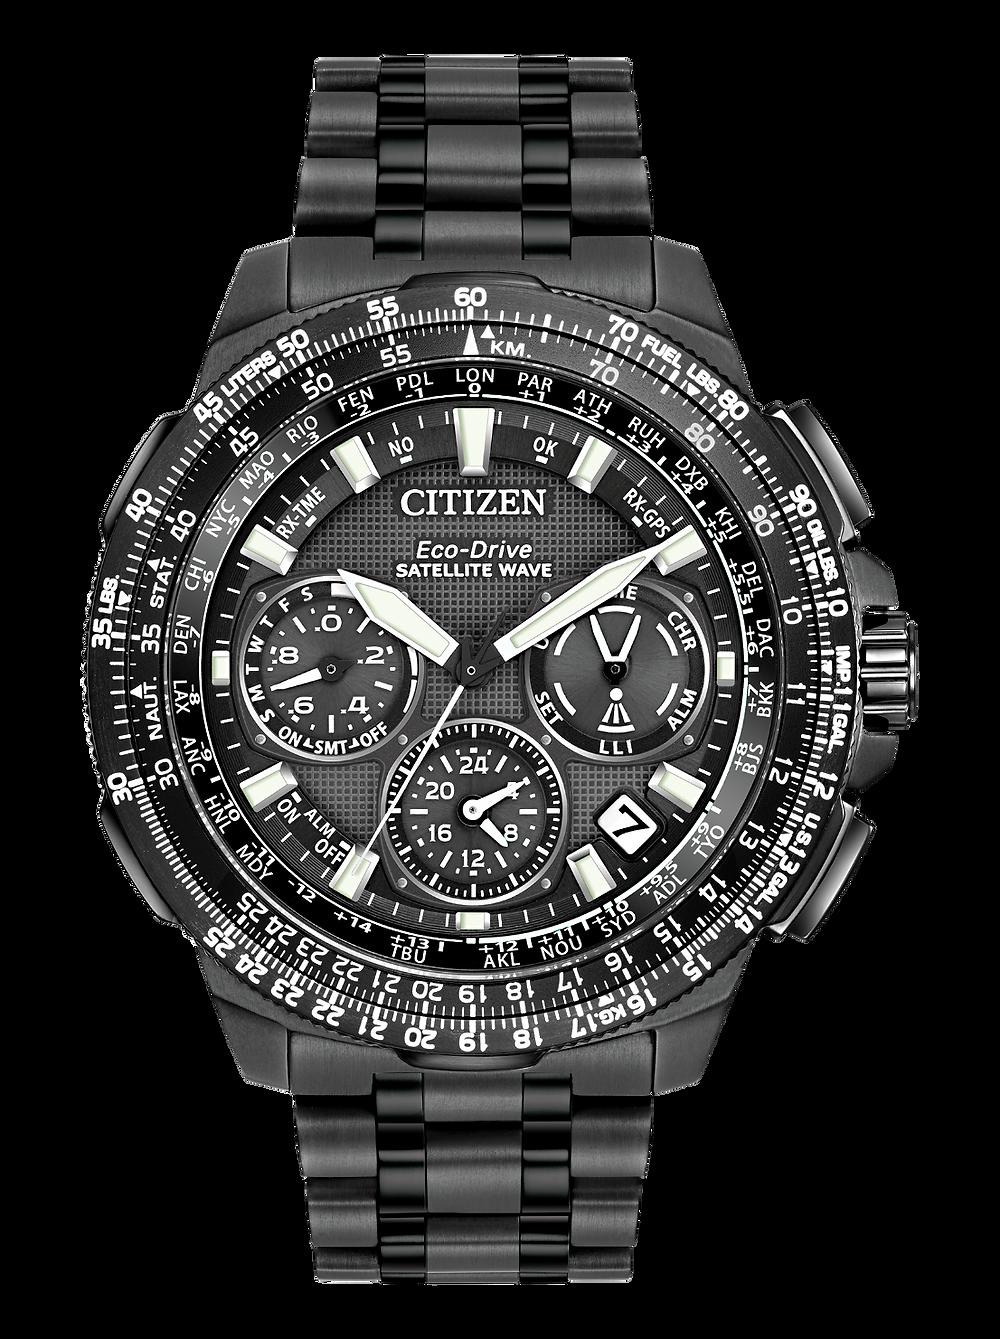 Reloj solar, gps, super titanium DLC + MRK Citizen Sky premier CC9025-51E